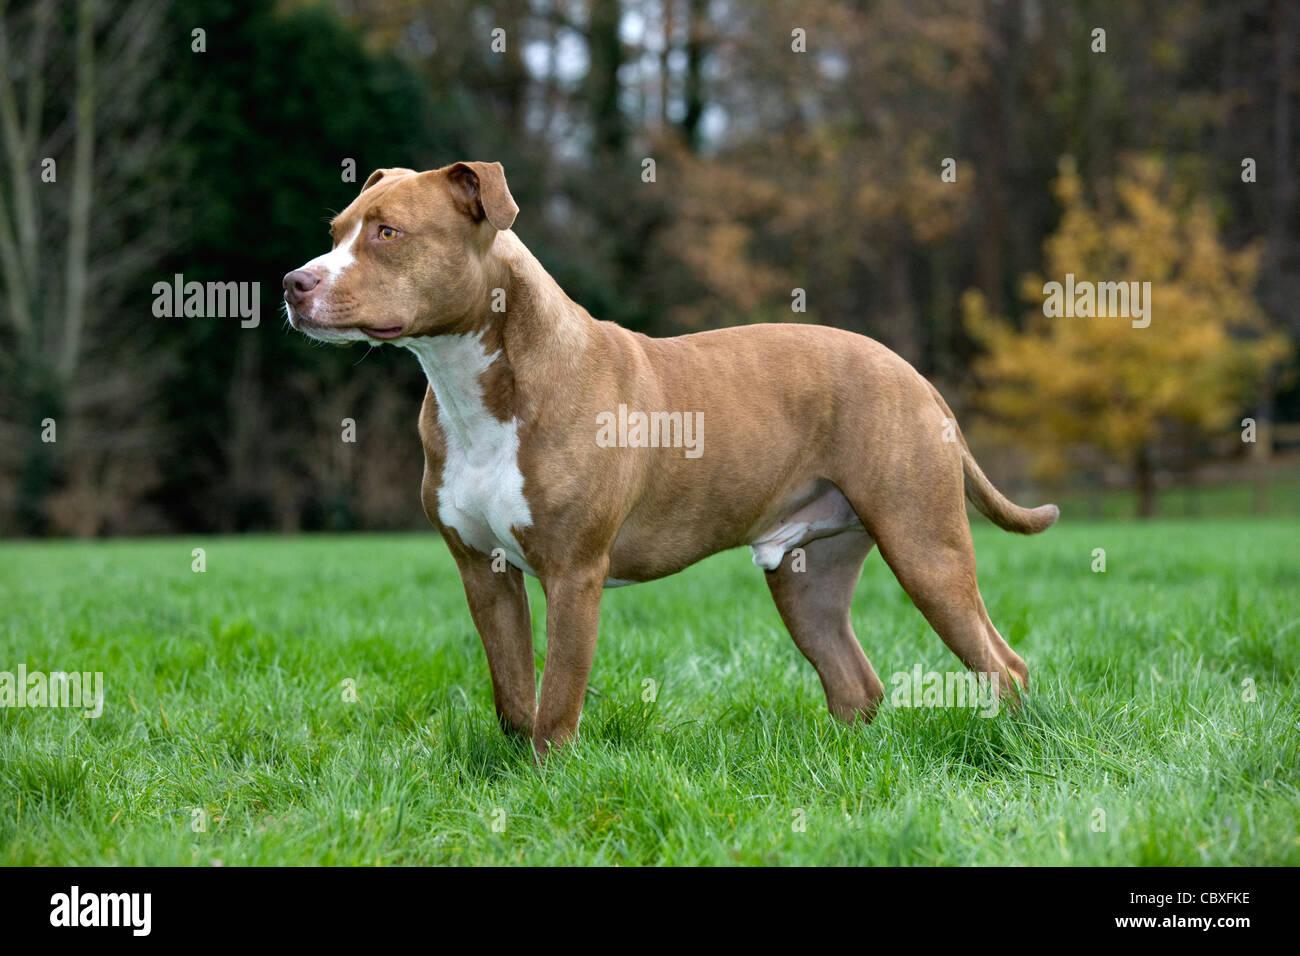 American Staffordshire Terrier in garden - Stock Image